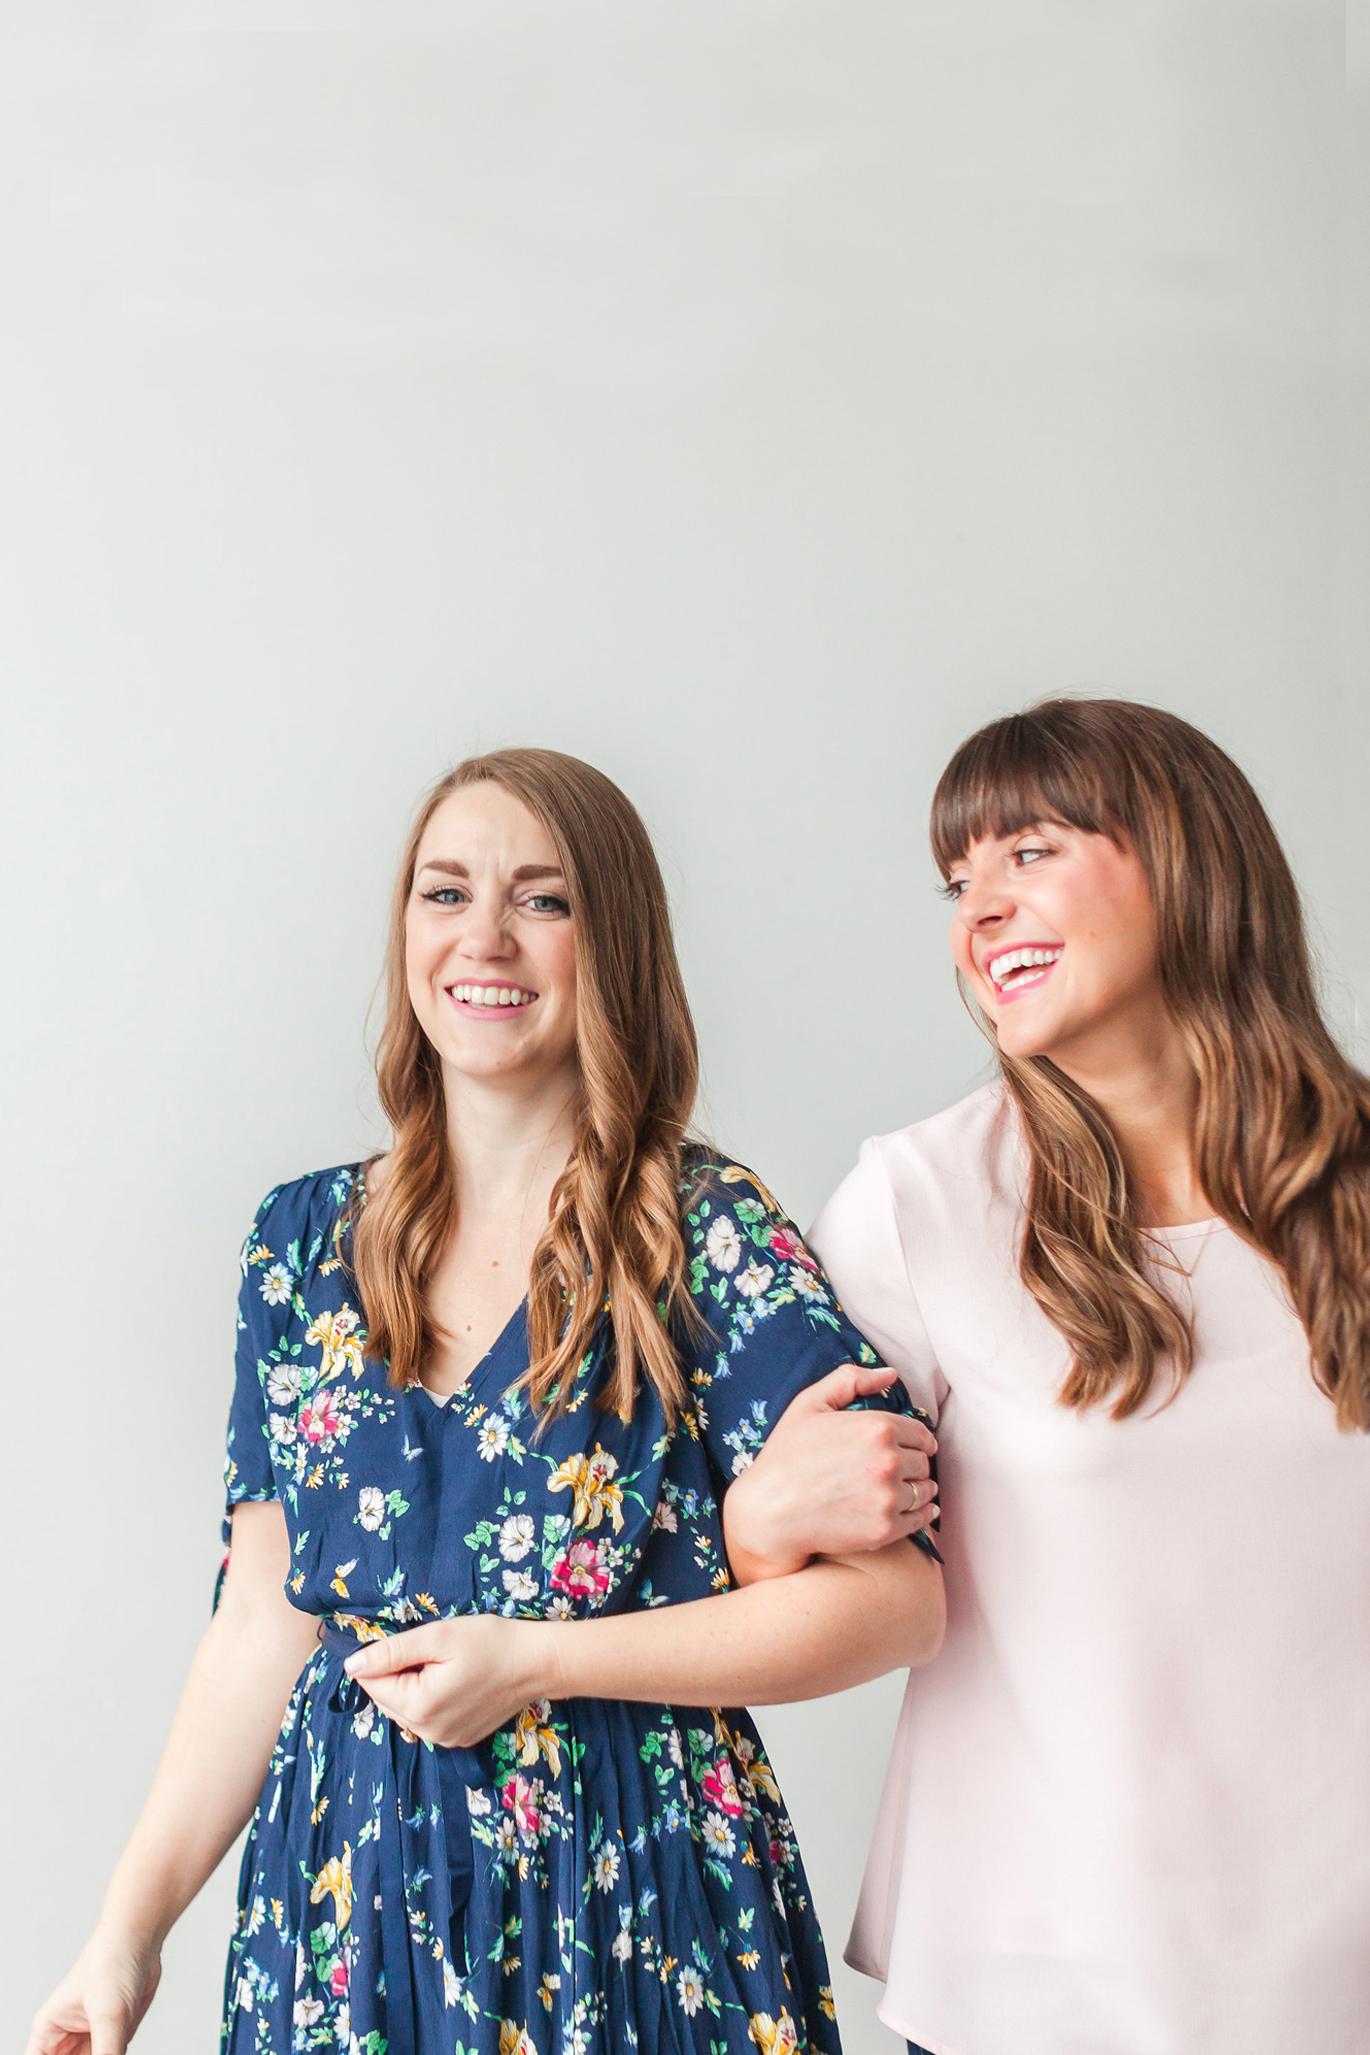 Sarah Skaggs and Jessica Burgess of Pretty Providence